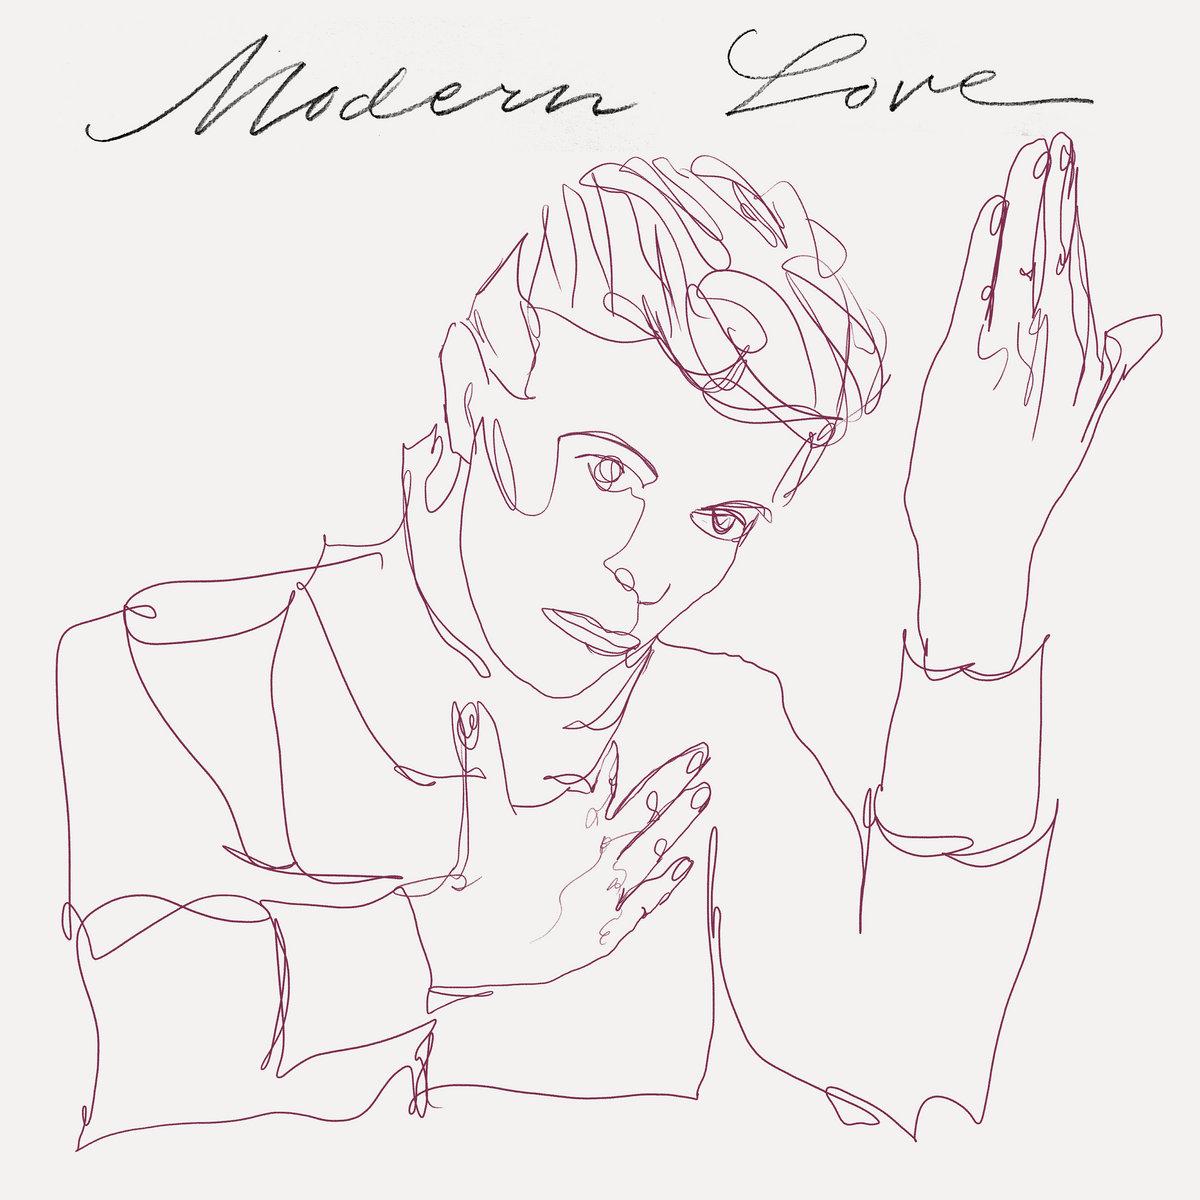 Stream The New David Bowie Tribute Album Modern Love Feat. Helado Negro, Khruangbin, Jeff Parker, L'Rain, & More